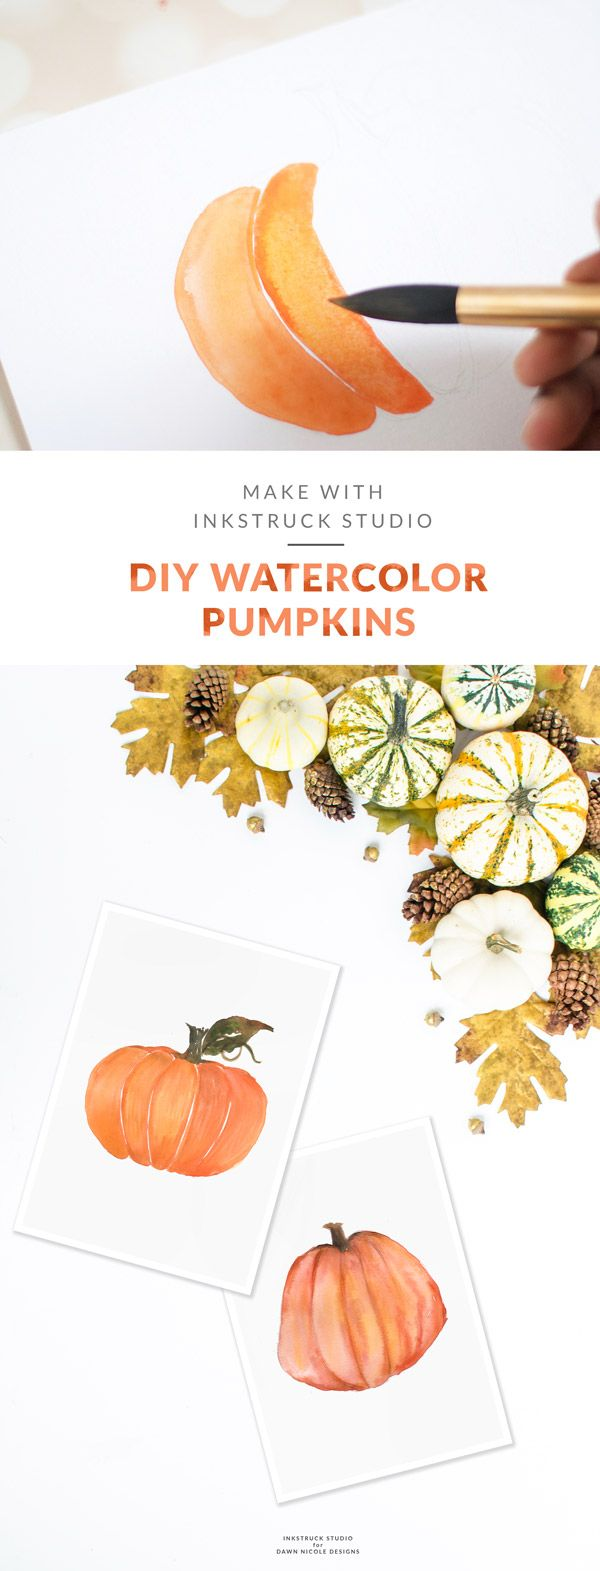 DIY Watercolor Pumpkin Tutorial